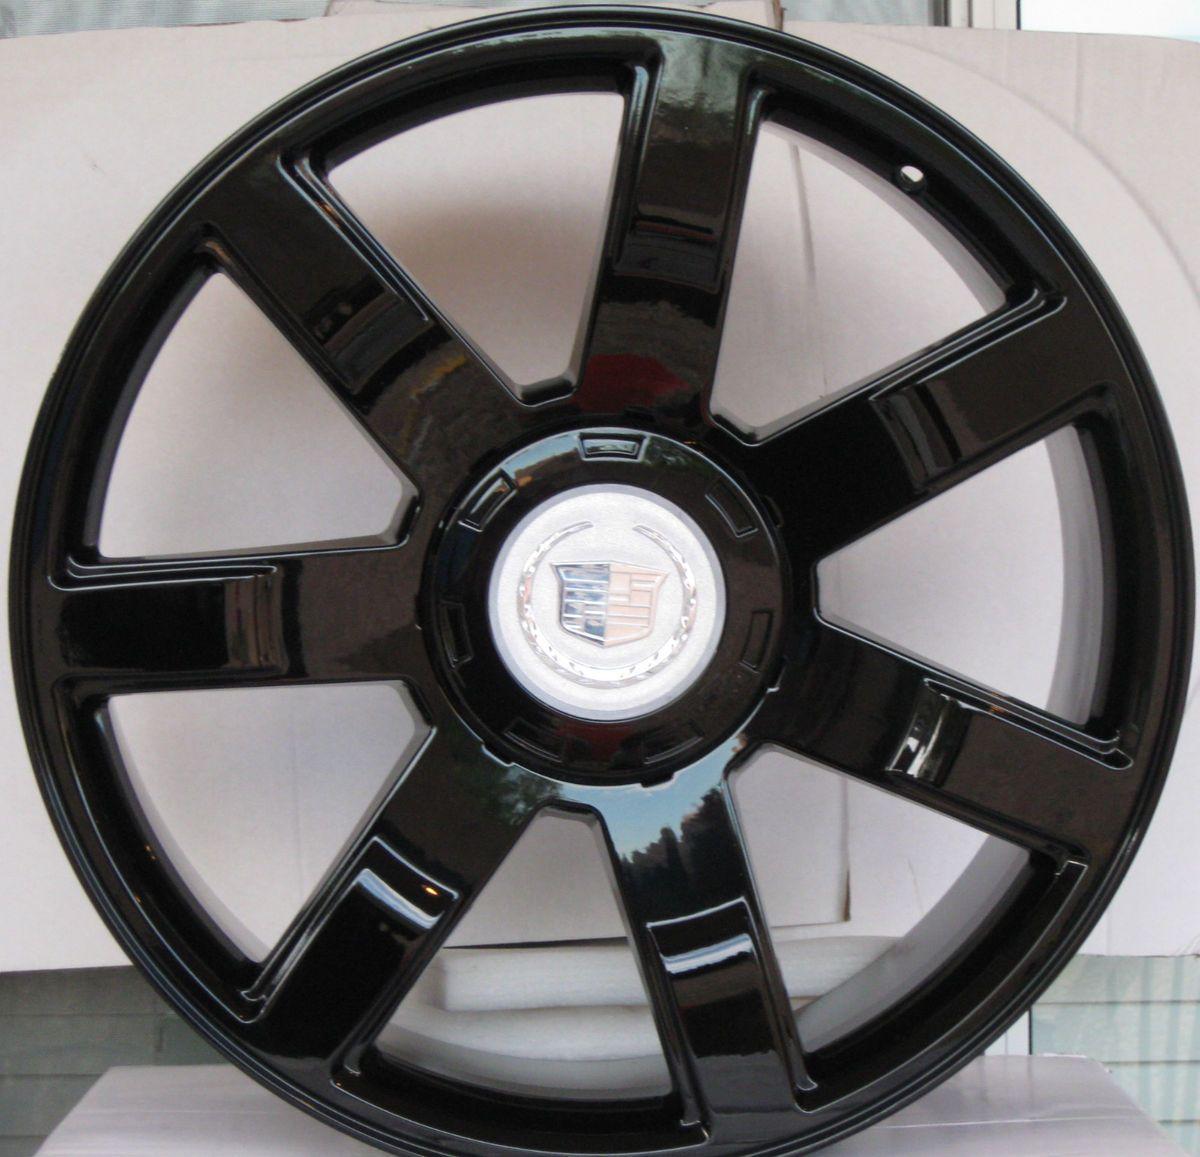 24 Cadillac Escalade Wheels Rims Phantom Black Finish 22